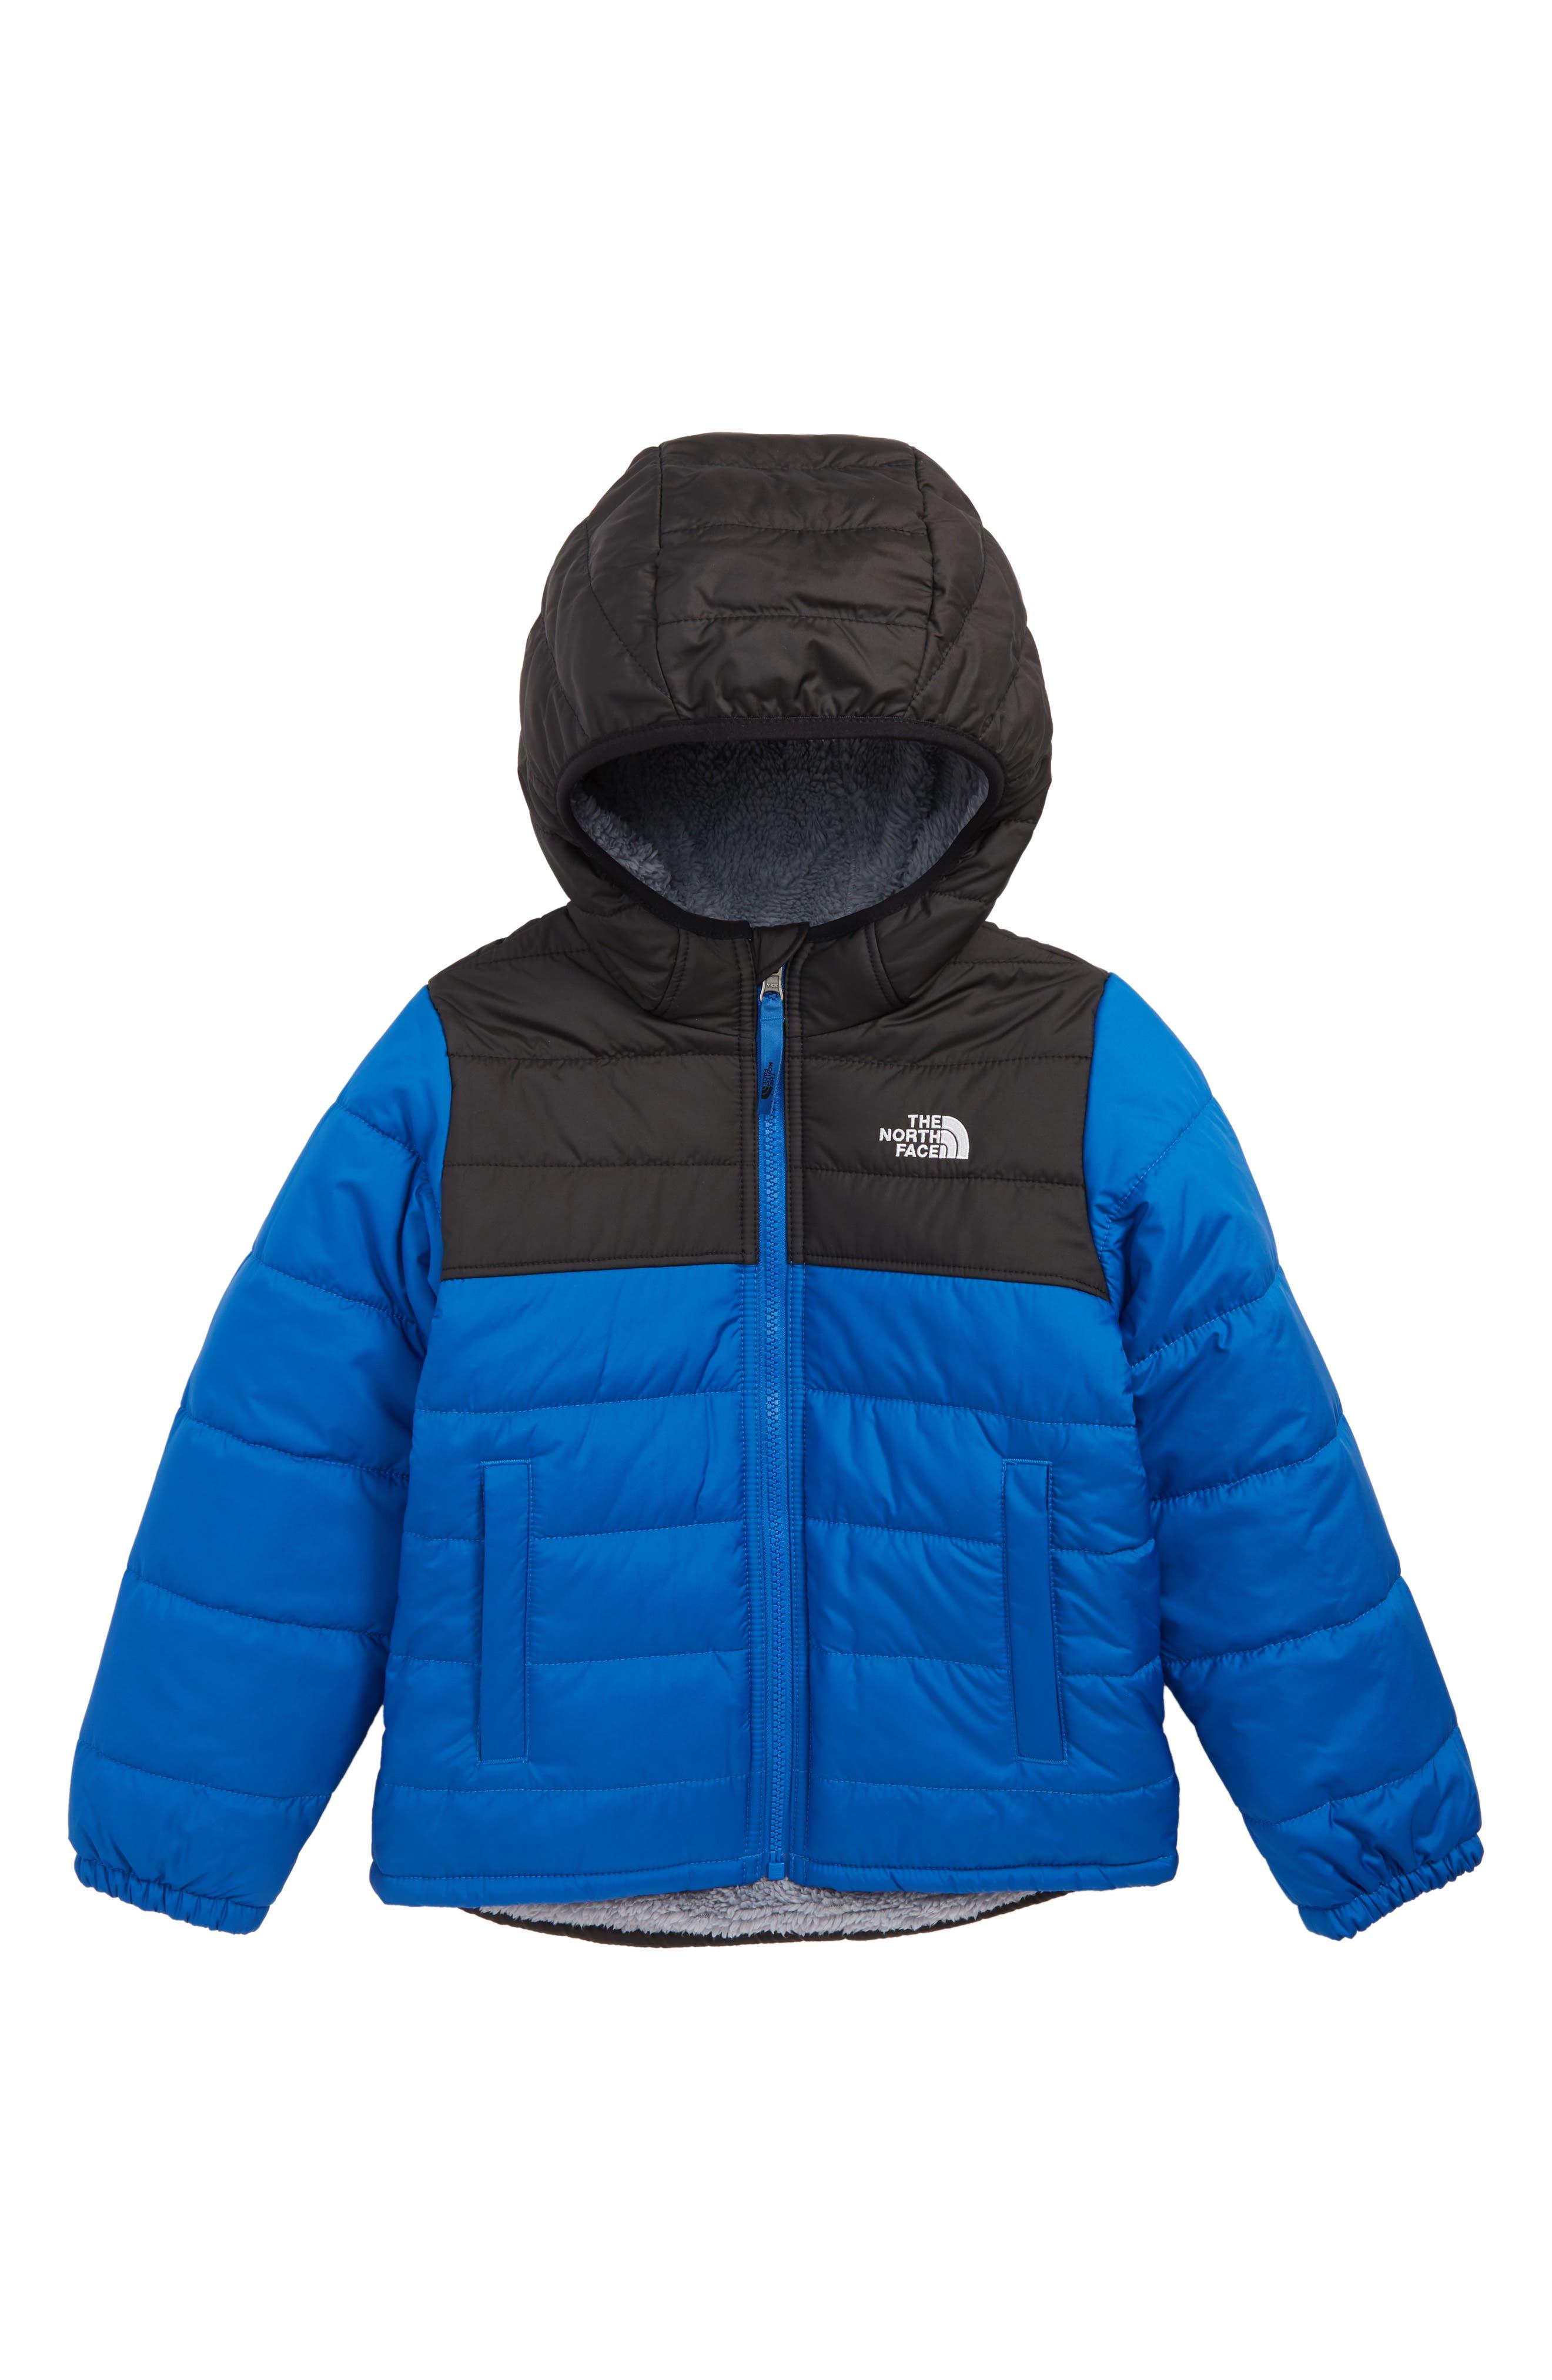 Chimborazo Reversible Jacket,                             Main thumbnail 1, color,                             TURKISH SEA